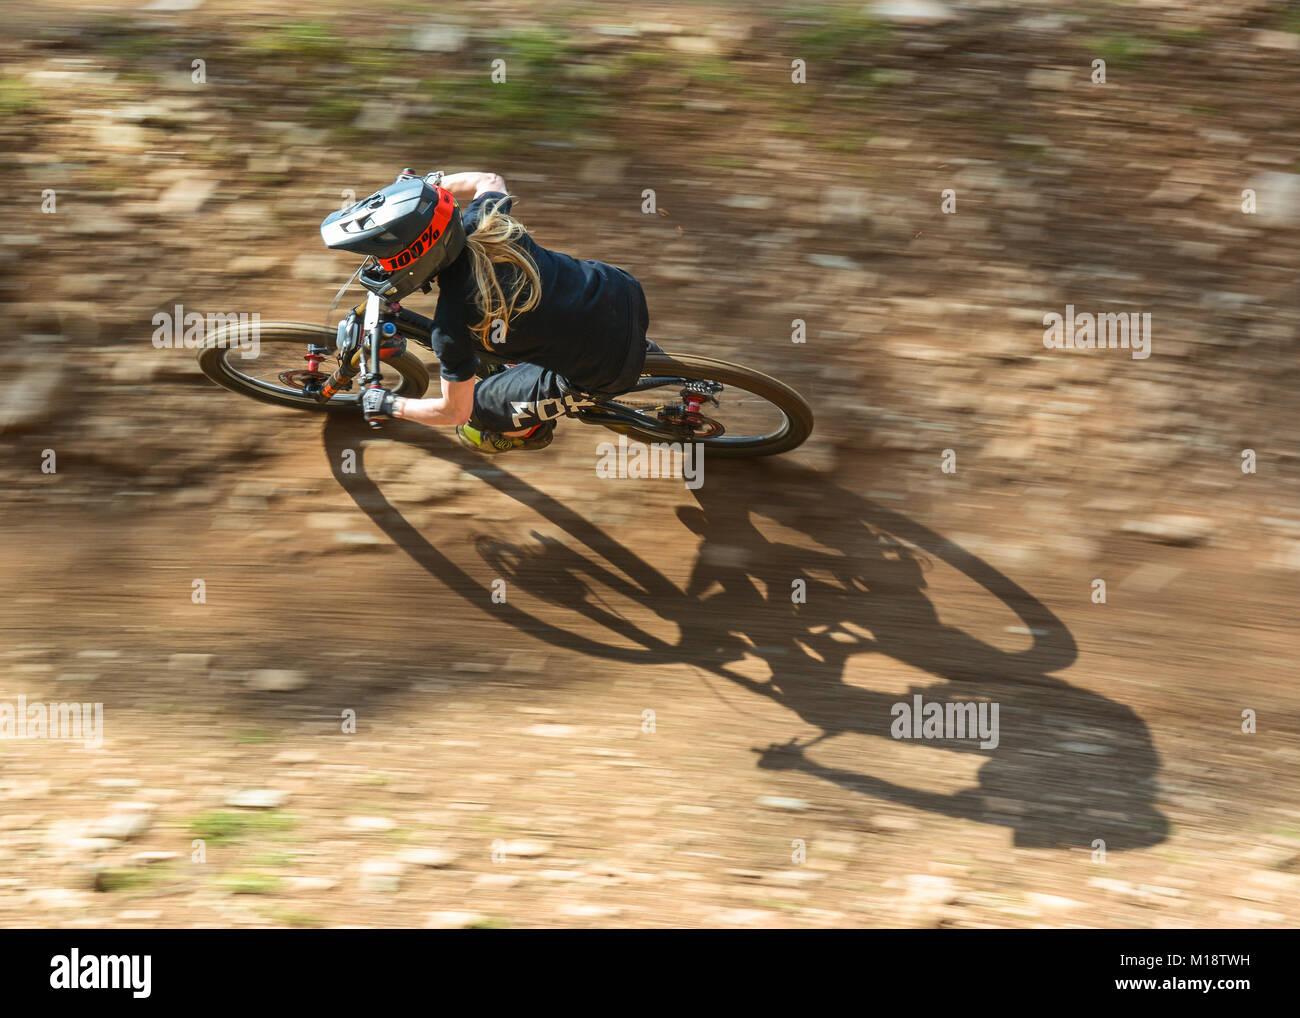 female downhill mountain biker - Stock Image